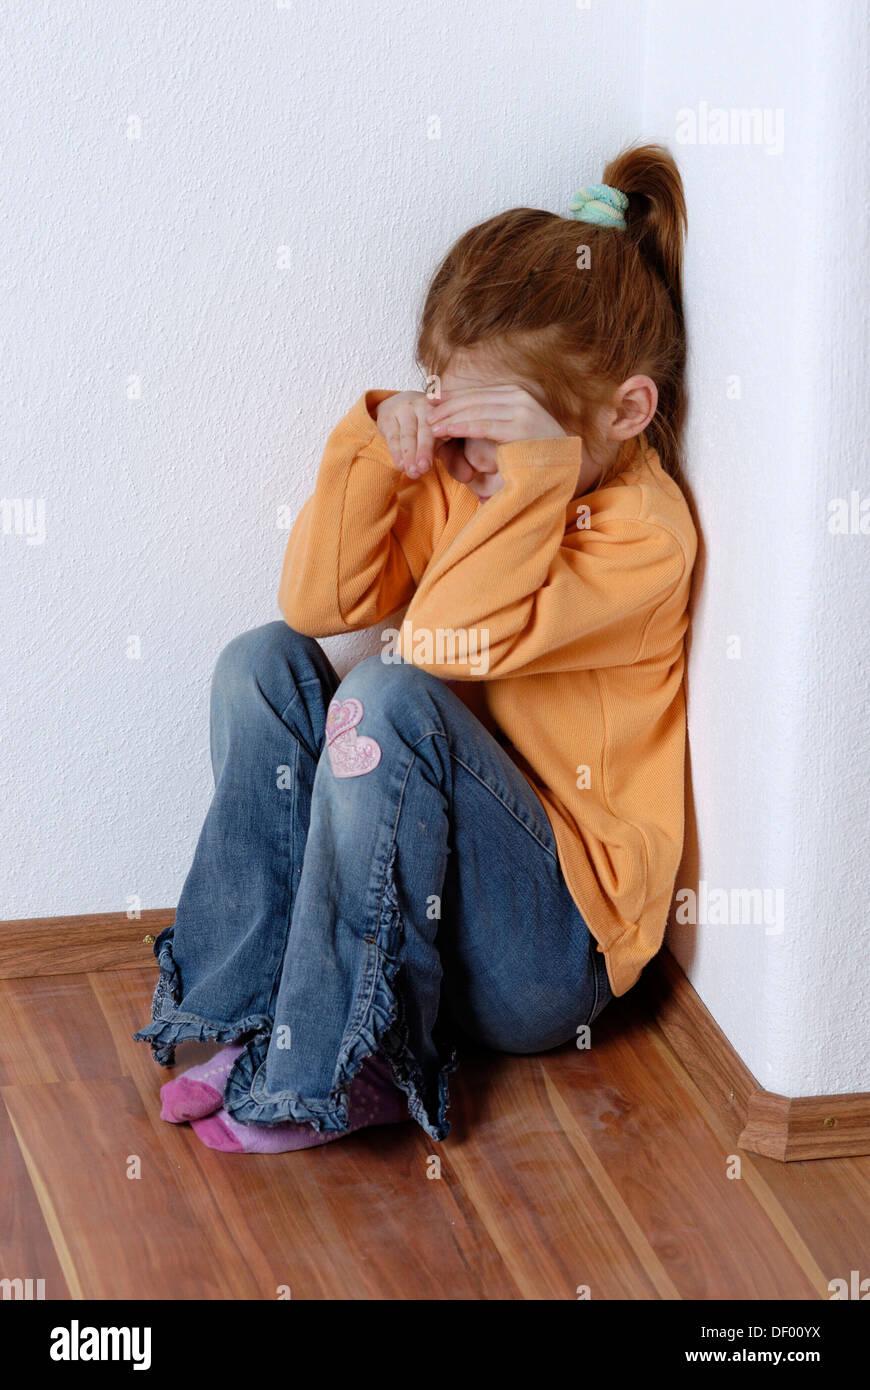 Child, girl, sad, obstinate - Stock Image